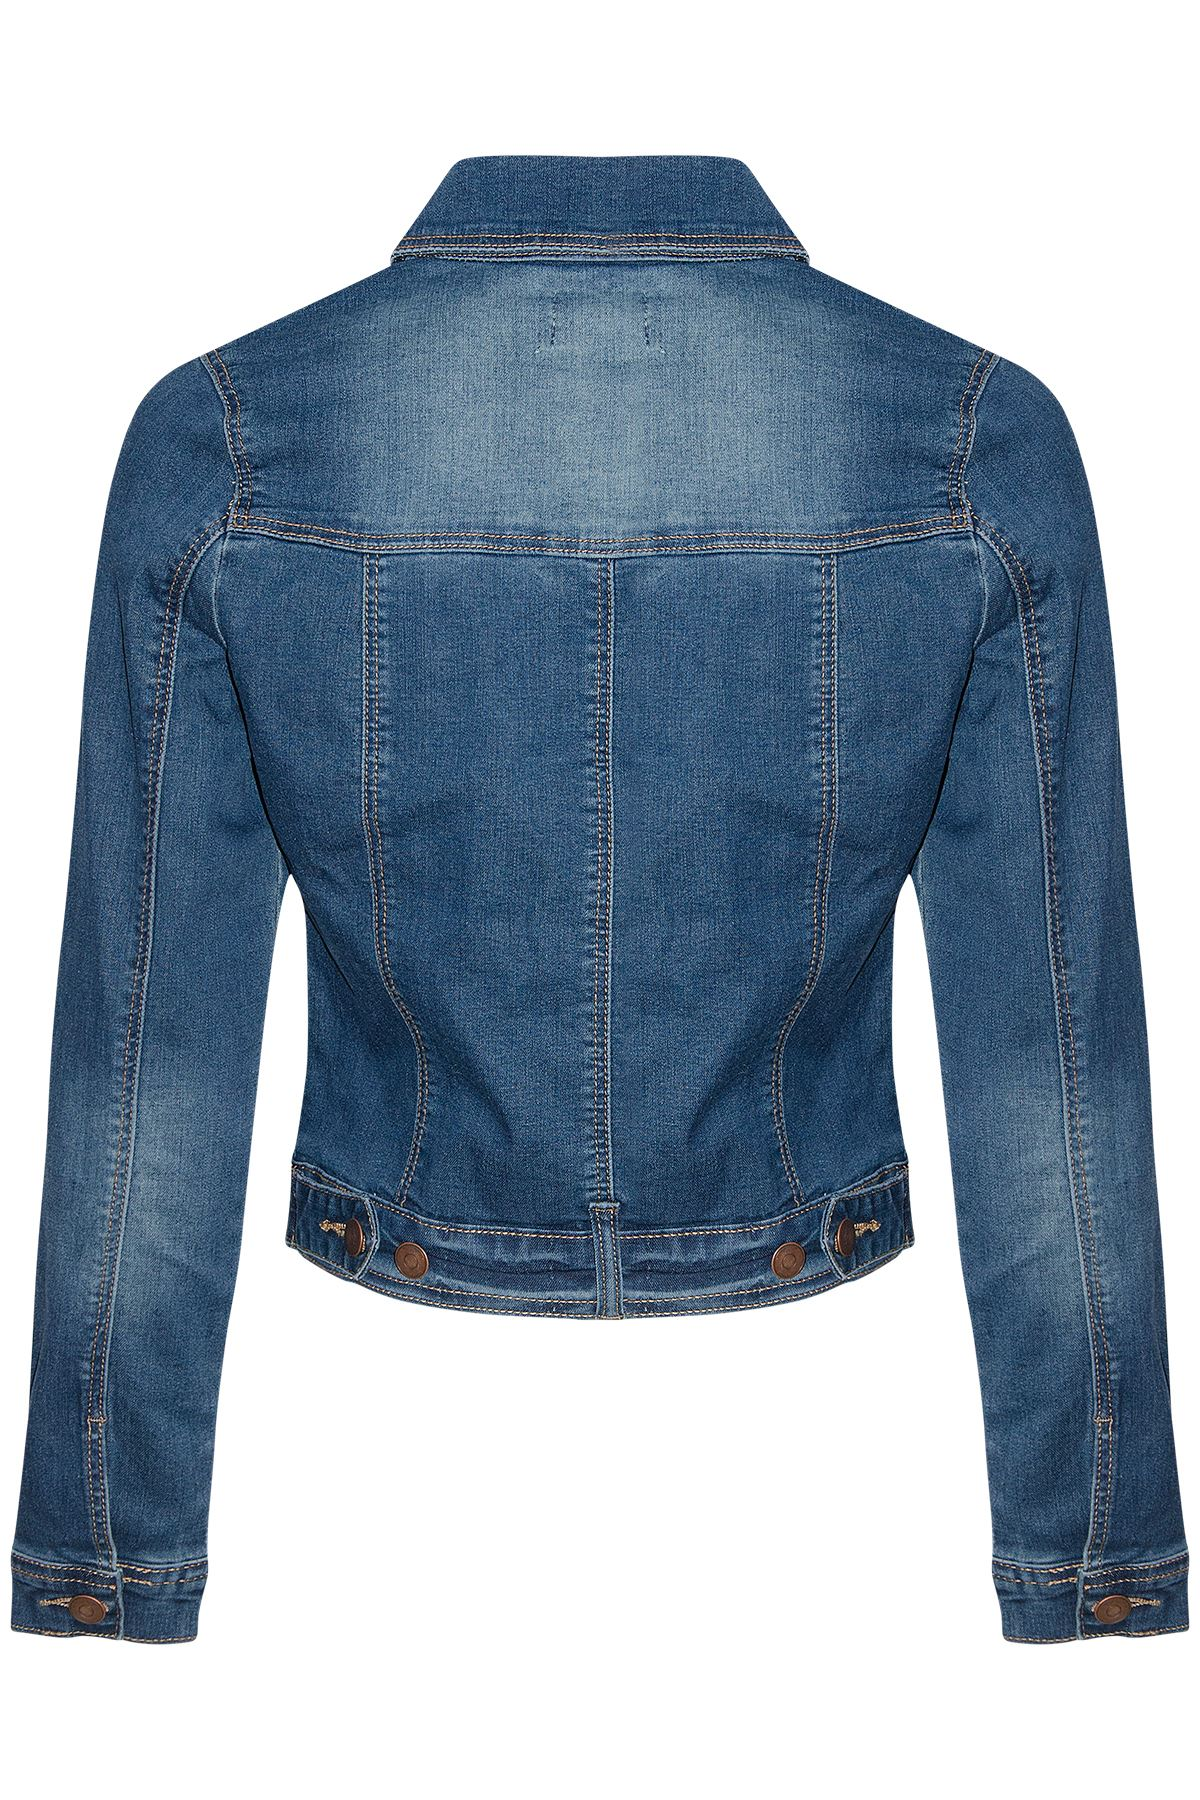 Womens Sleeve Vintage Wash Waistcoat Denim Jean Jacket Stretch Long